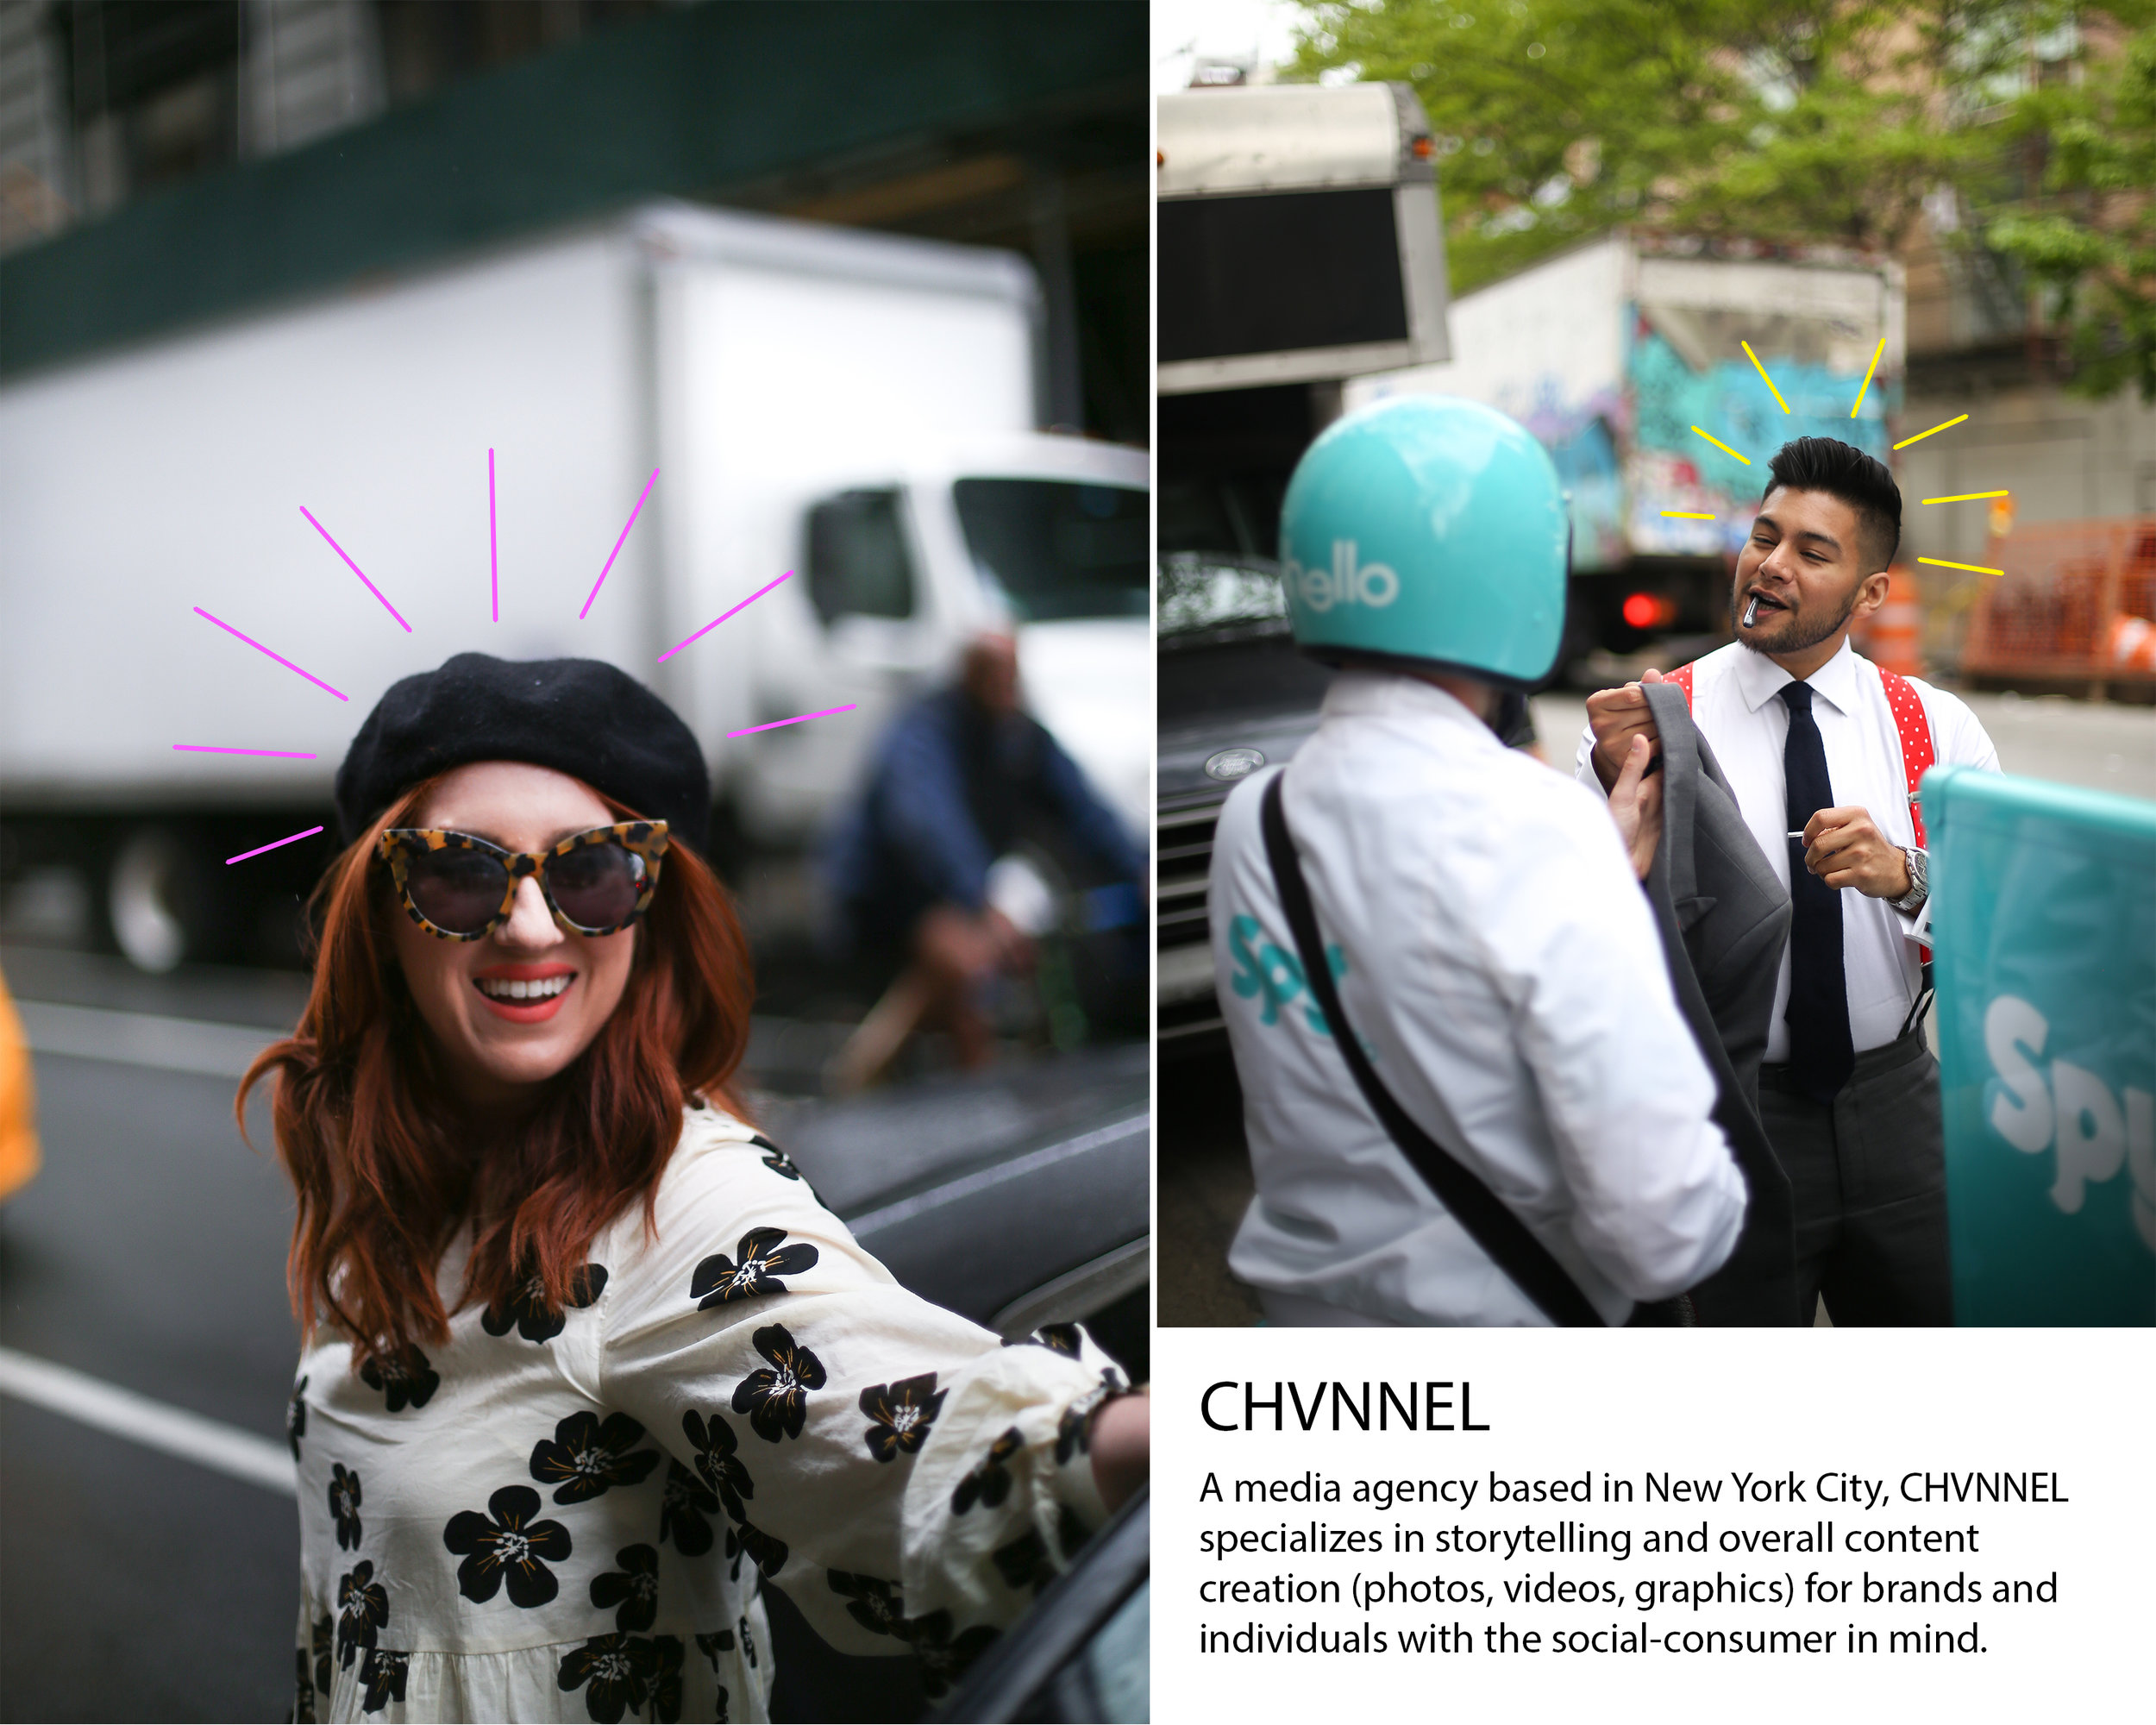 Inquiries: natalie@chvnnel.me  Pictured: (left) Megan Ziets (right) Diego Leon